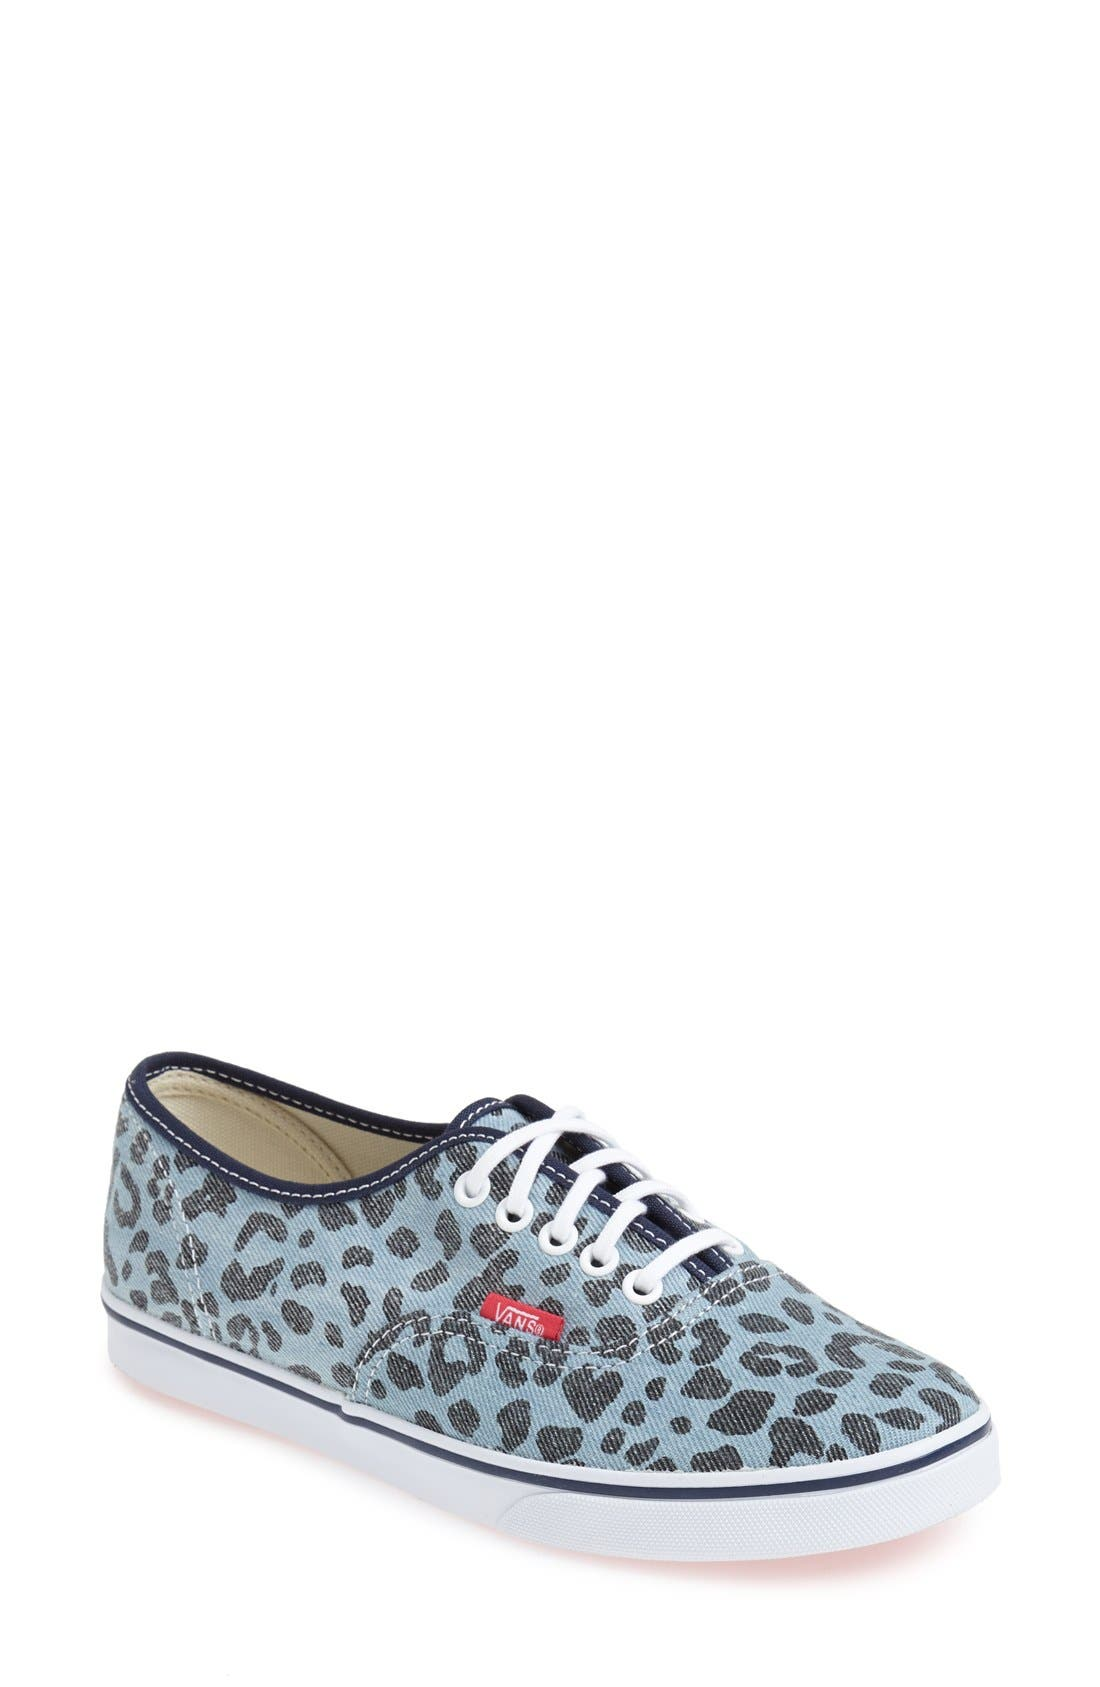 Alternate Image 1 Selected - Vans 'Authentic - Lo Pro' Leopard Print Sneaker (Women)